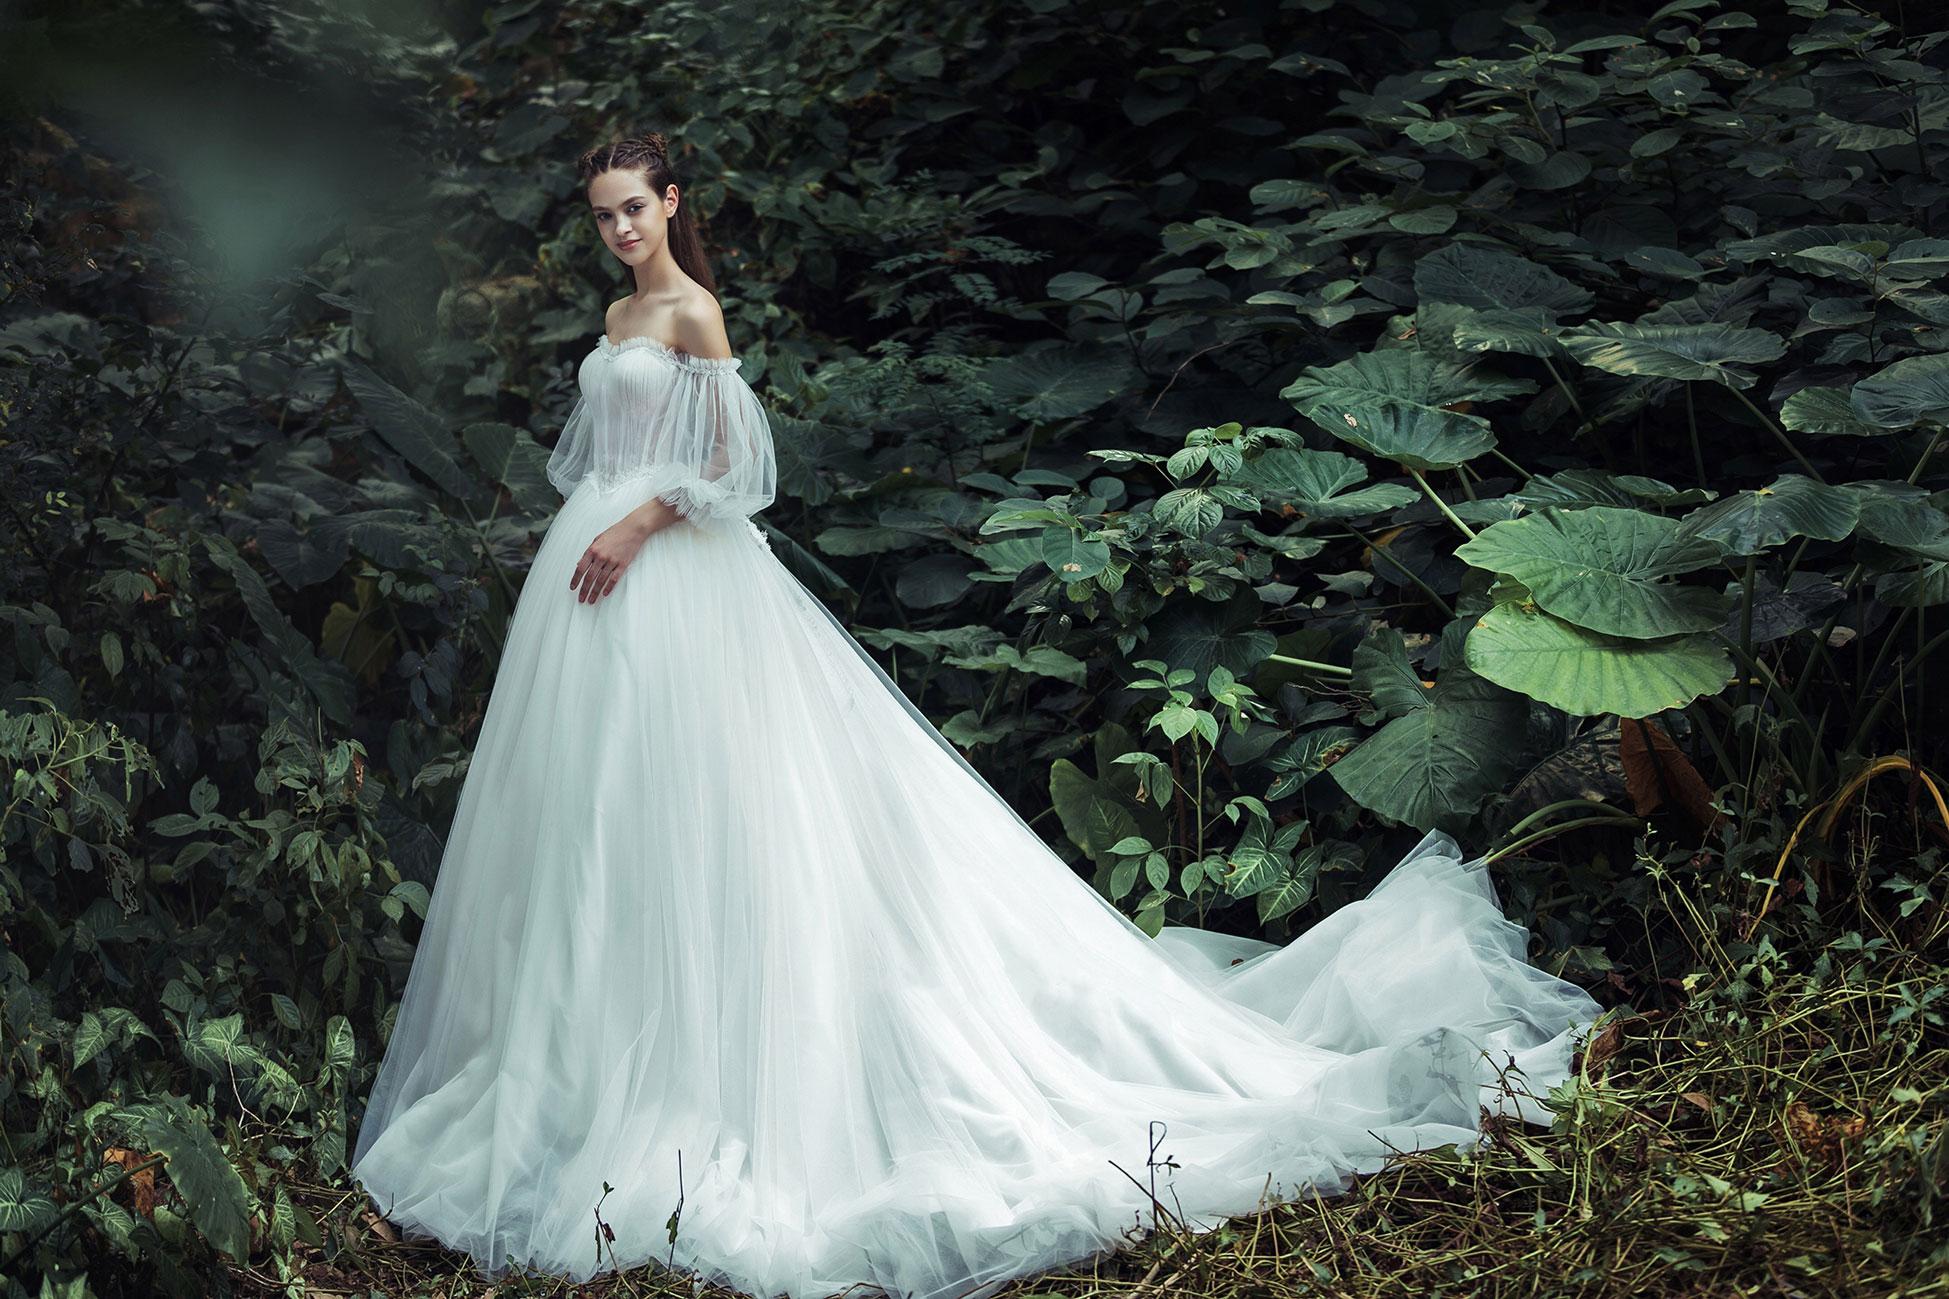 off-the-shoulder-puff-sleeve-sweetheart-neckline-wedding-dress.jpg